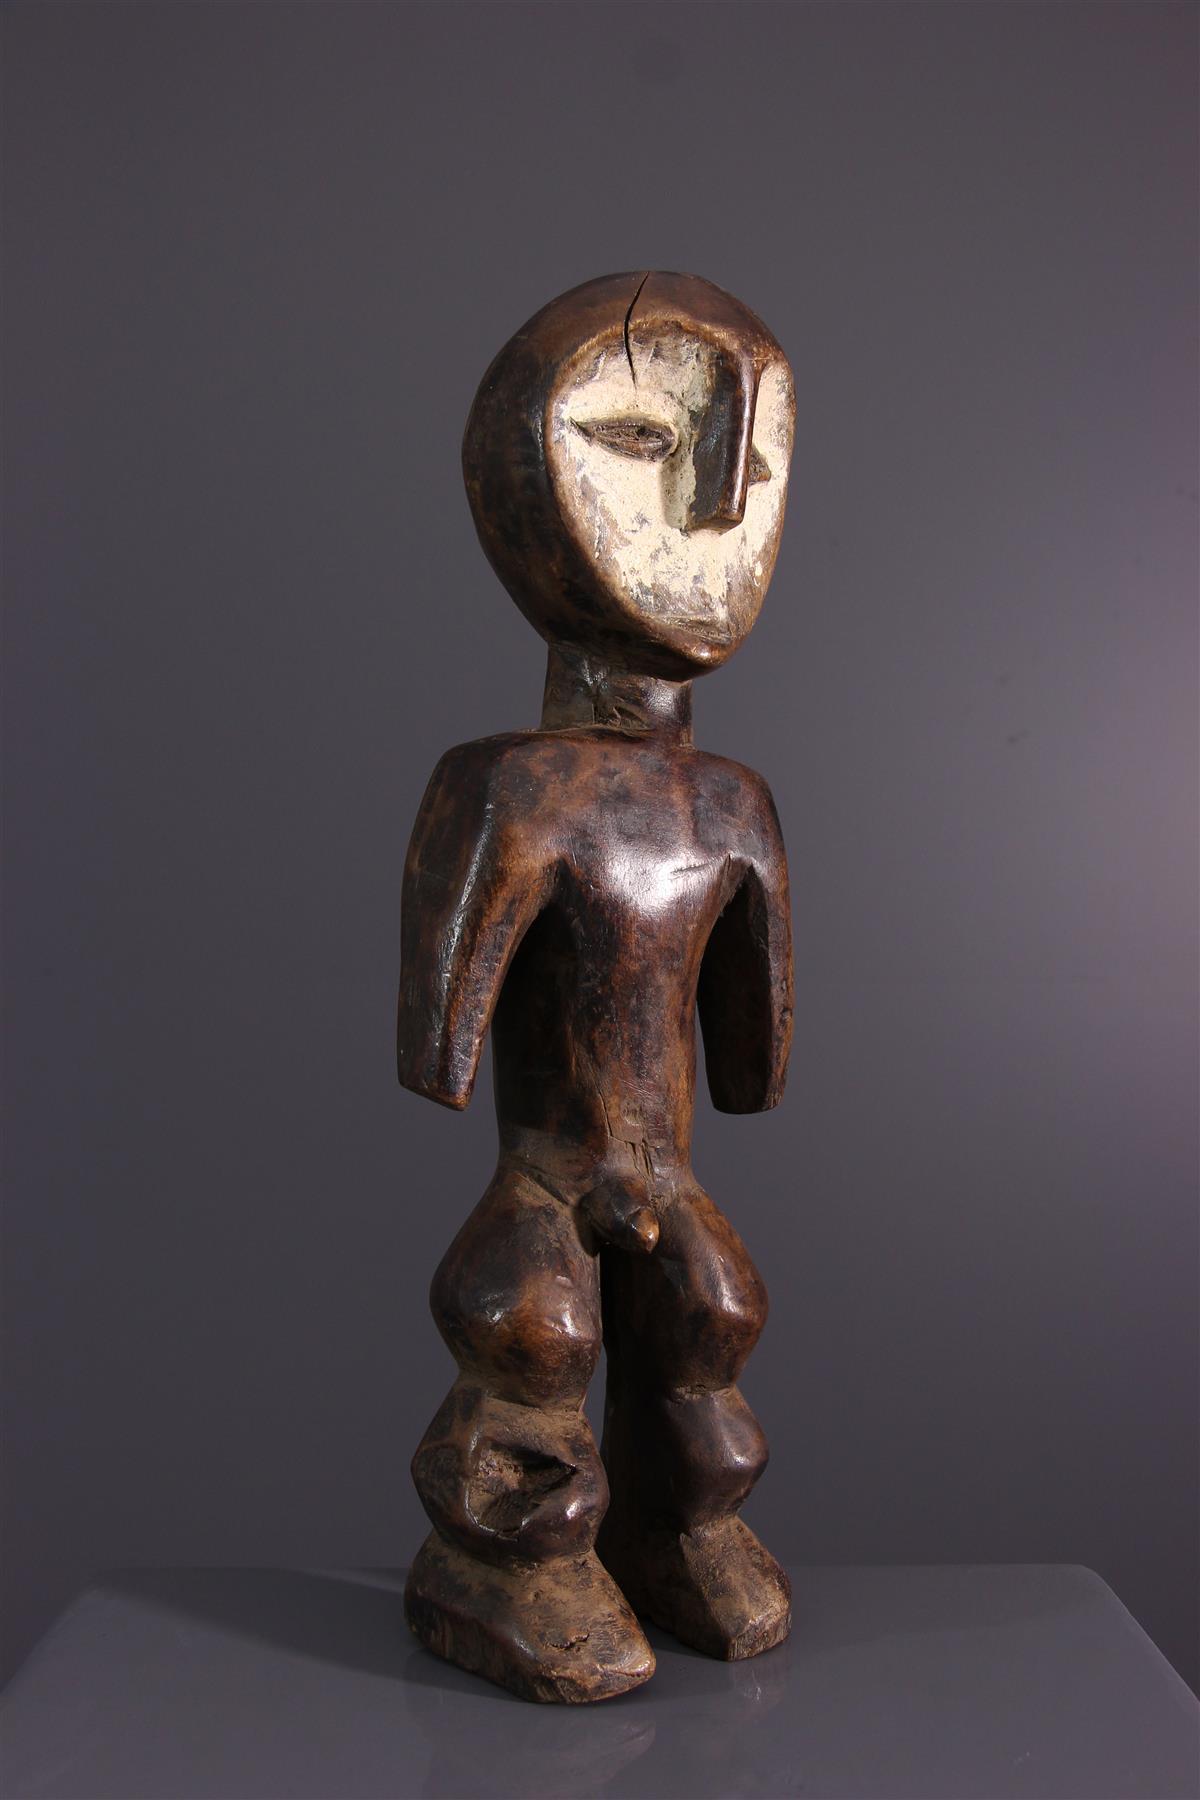 Lega Figurine - African art